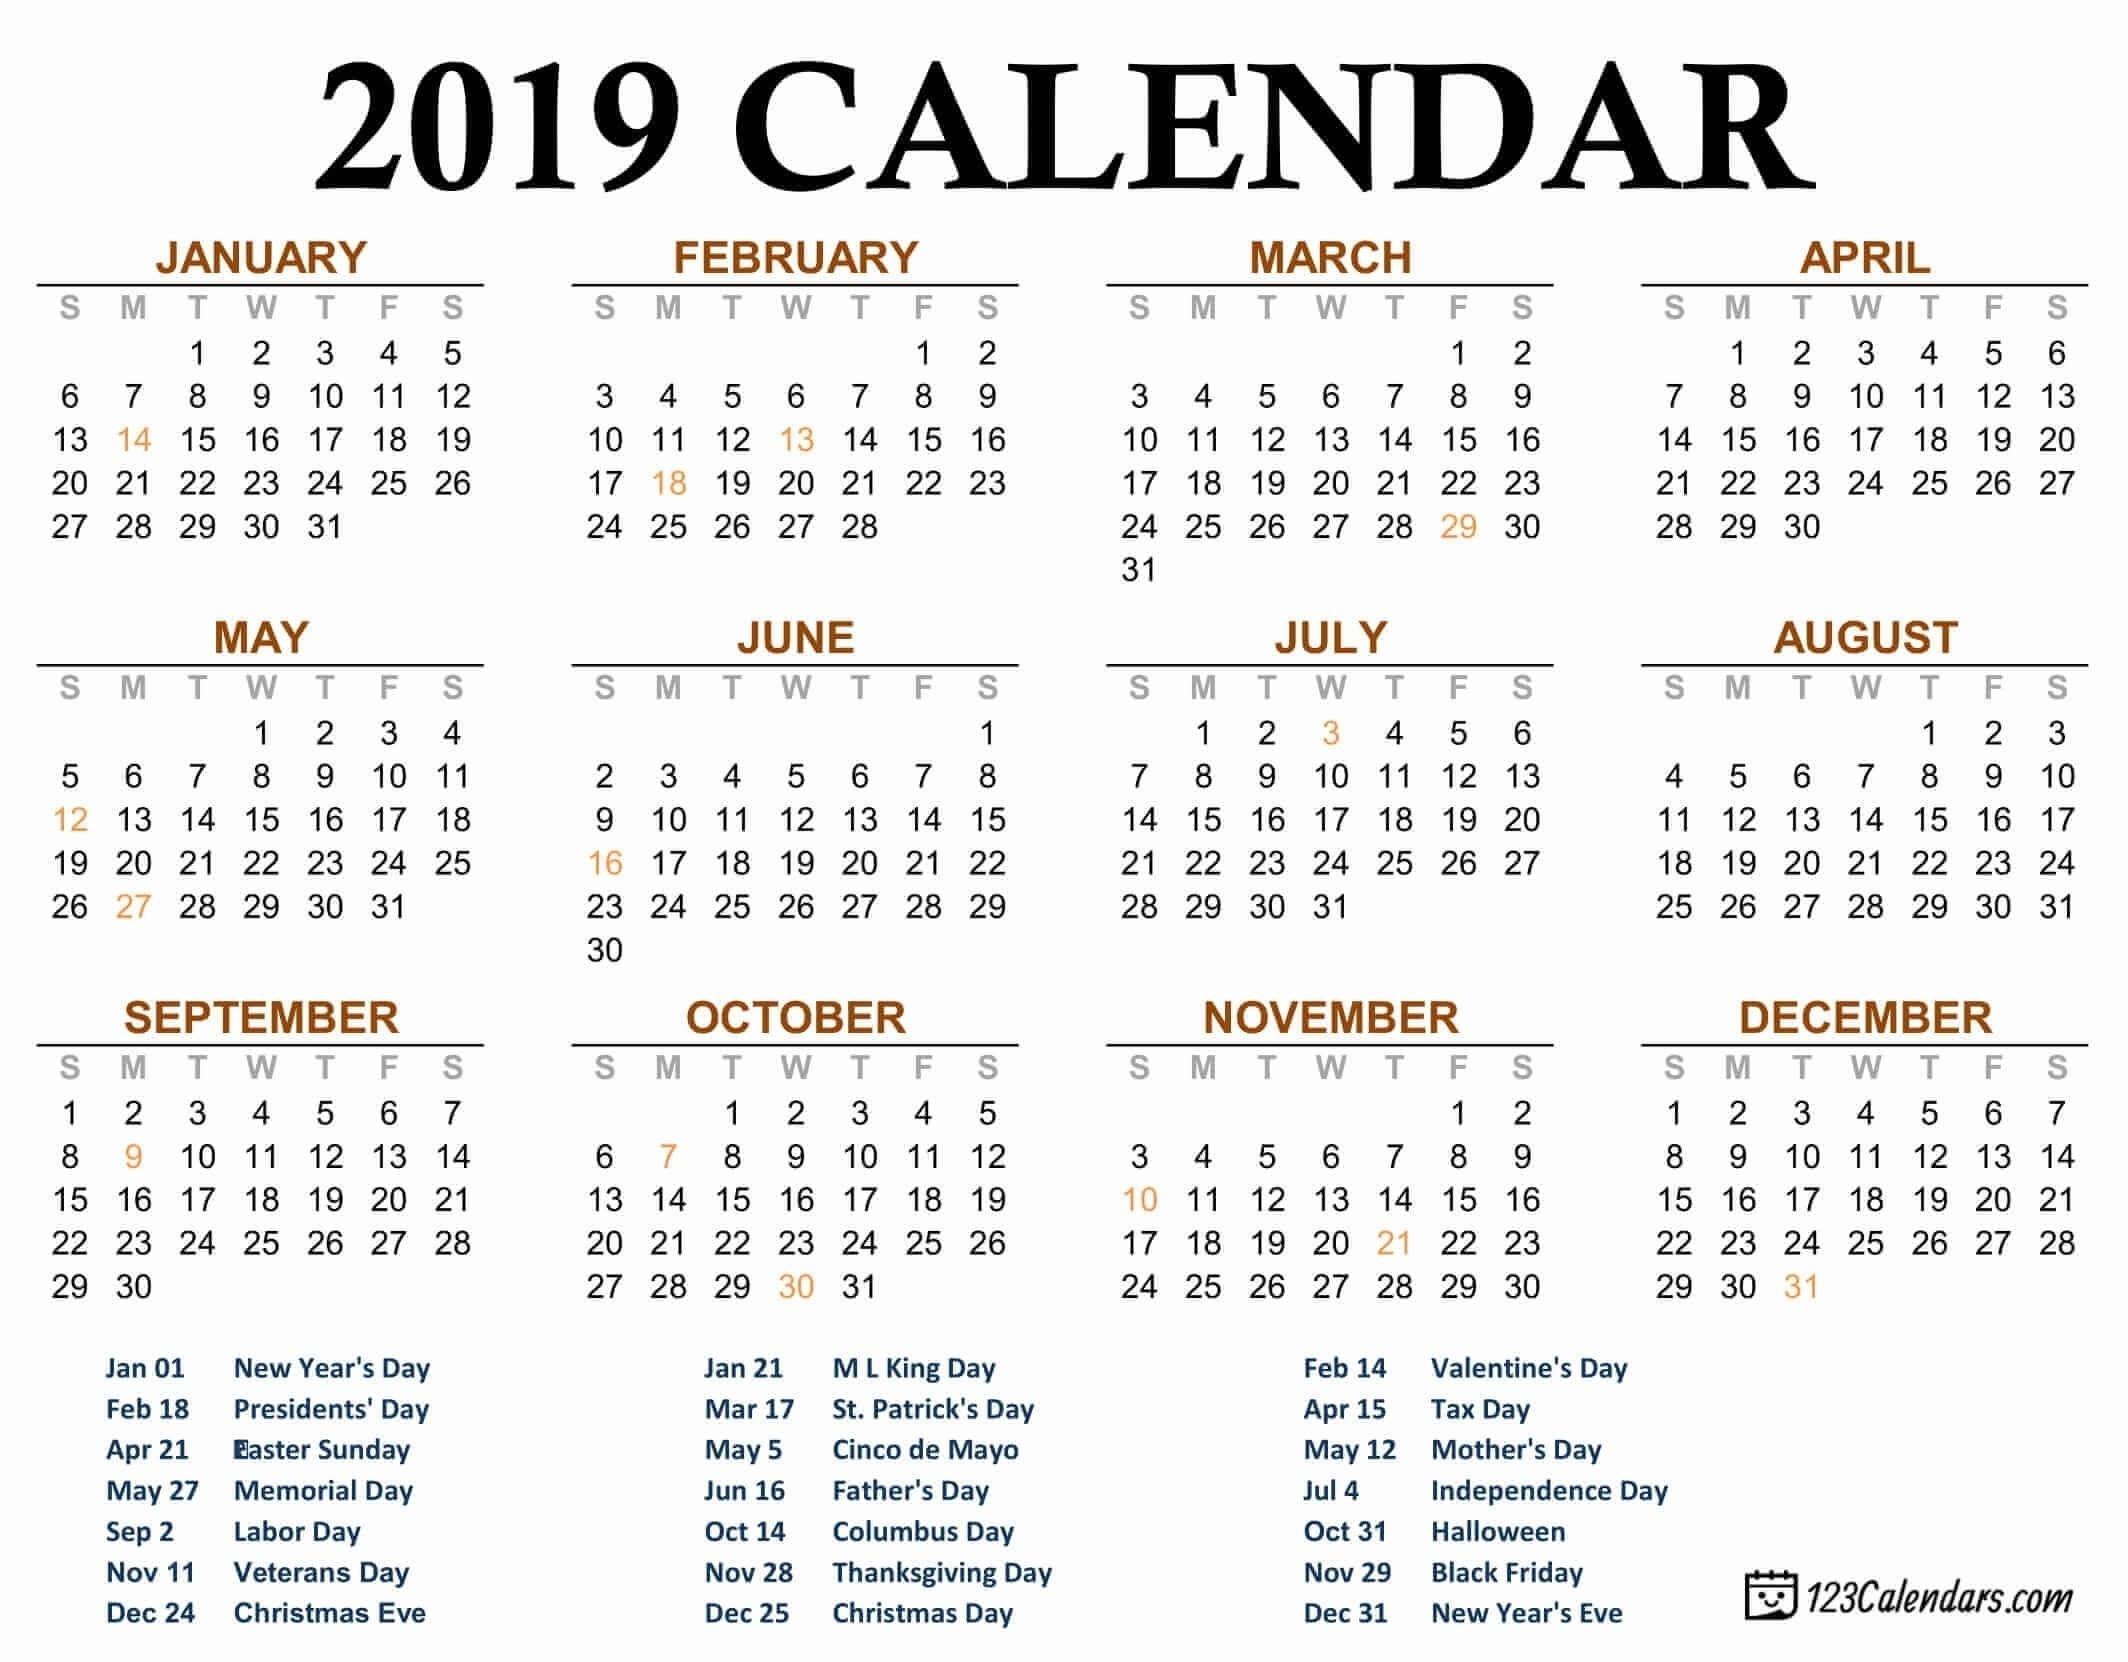 2019 Printable Calendar - 123Calendars Free Check More At